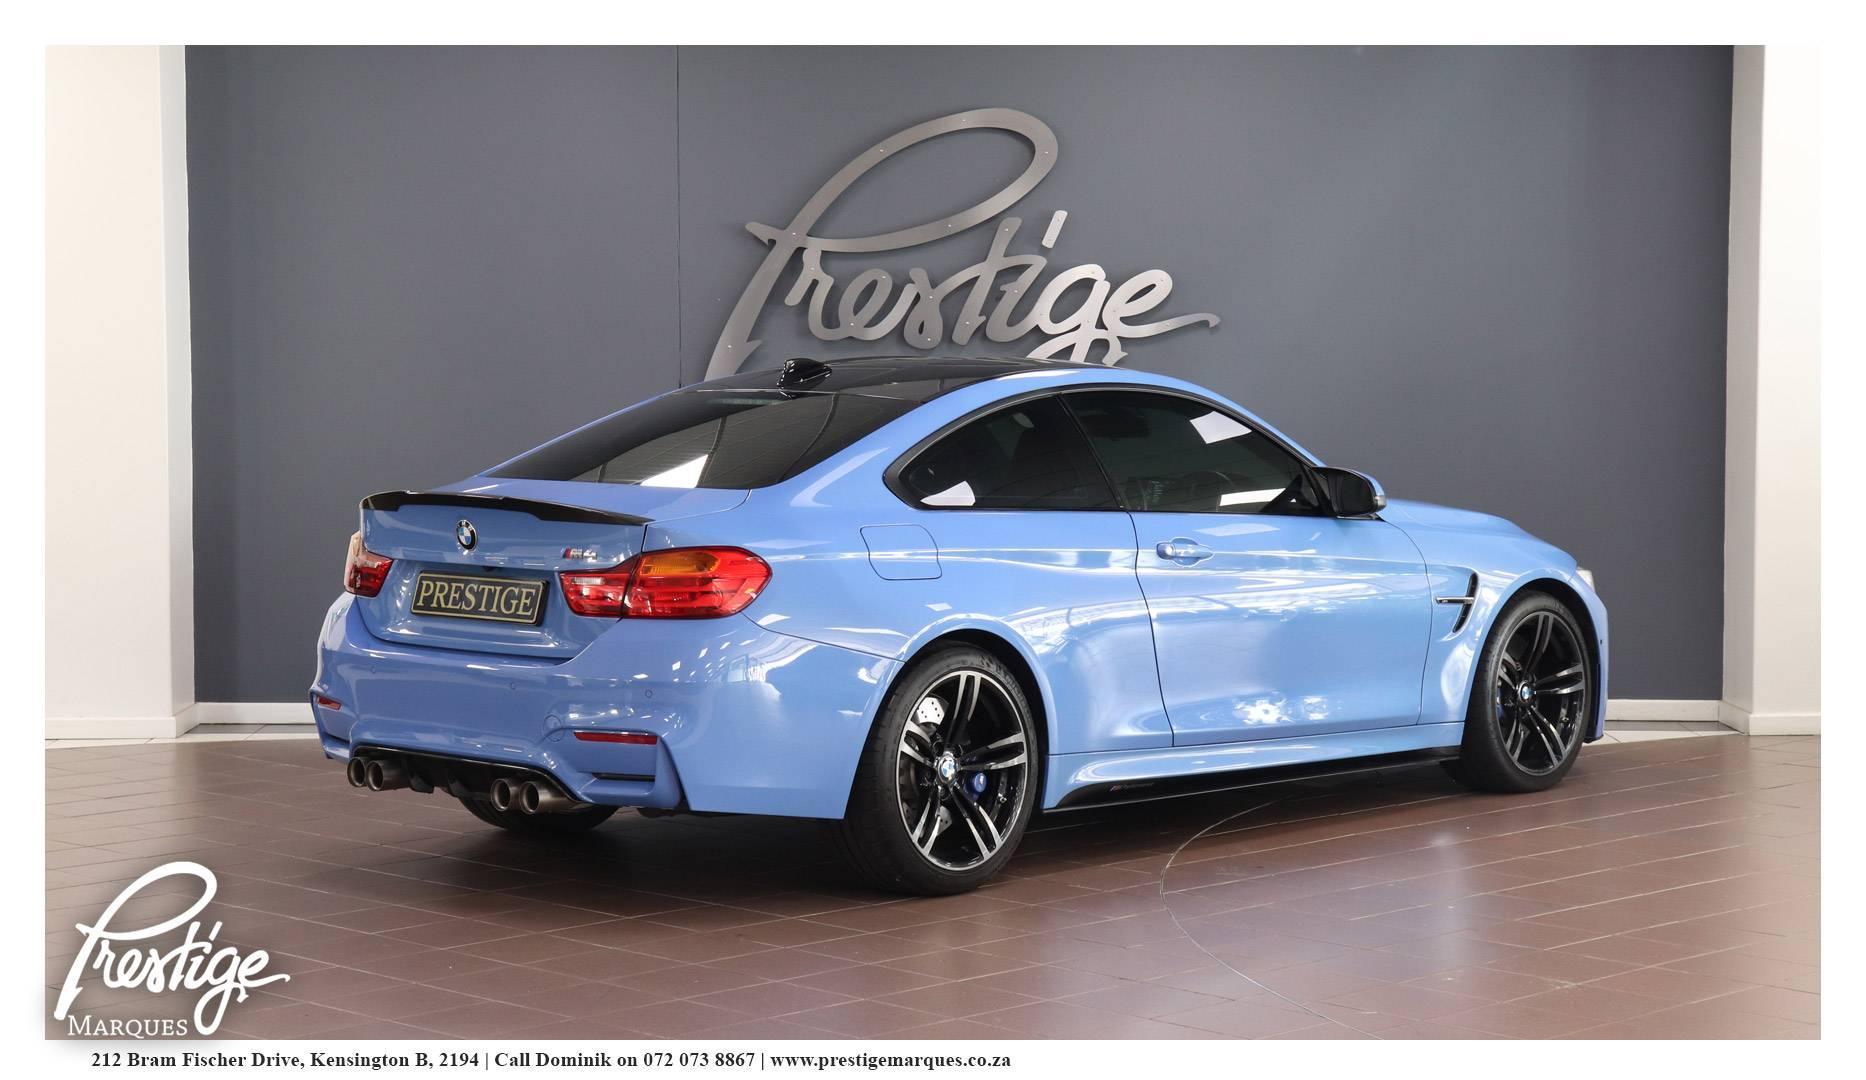 2015-BMW-M4-Coupe-Blue-Prestige-Marques-Randburg-Sandton-4